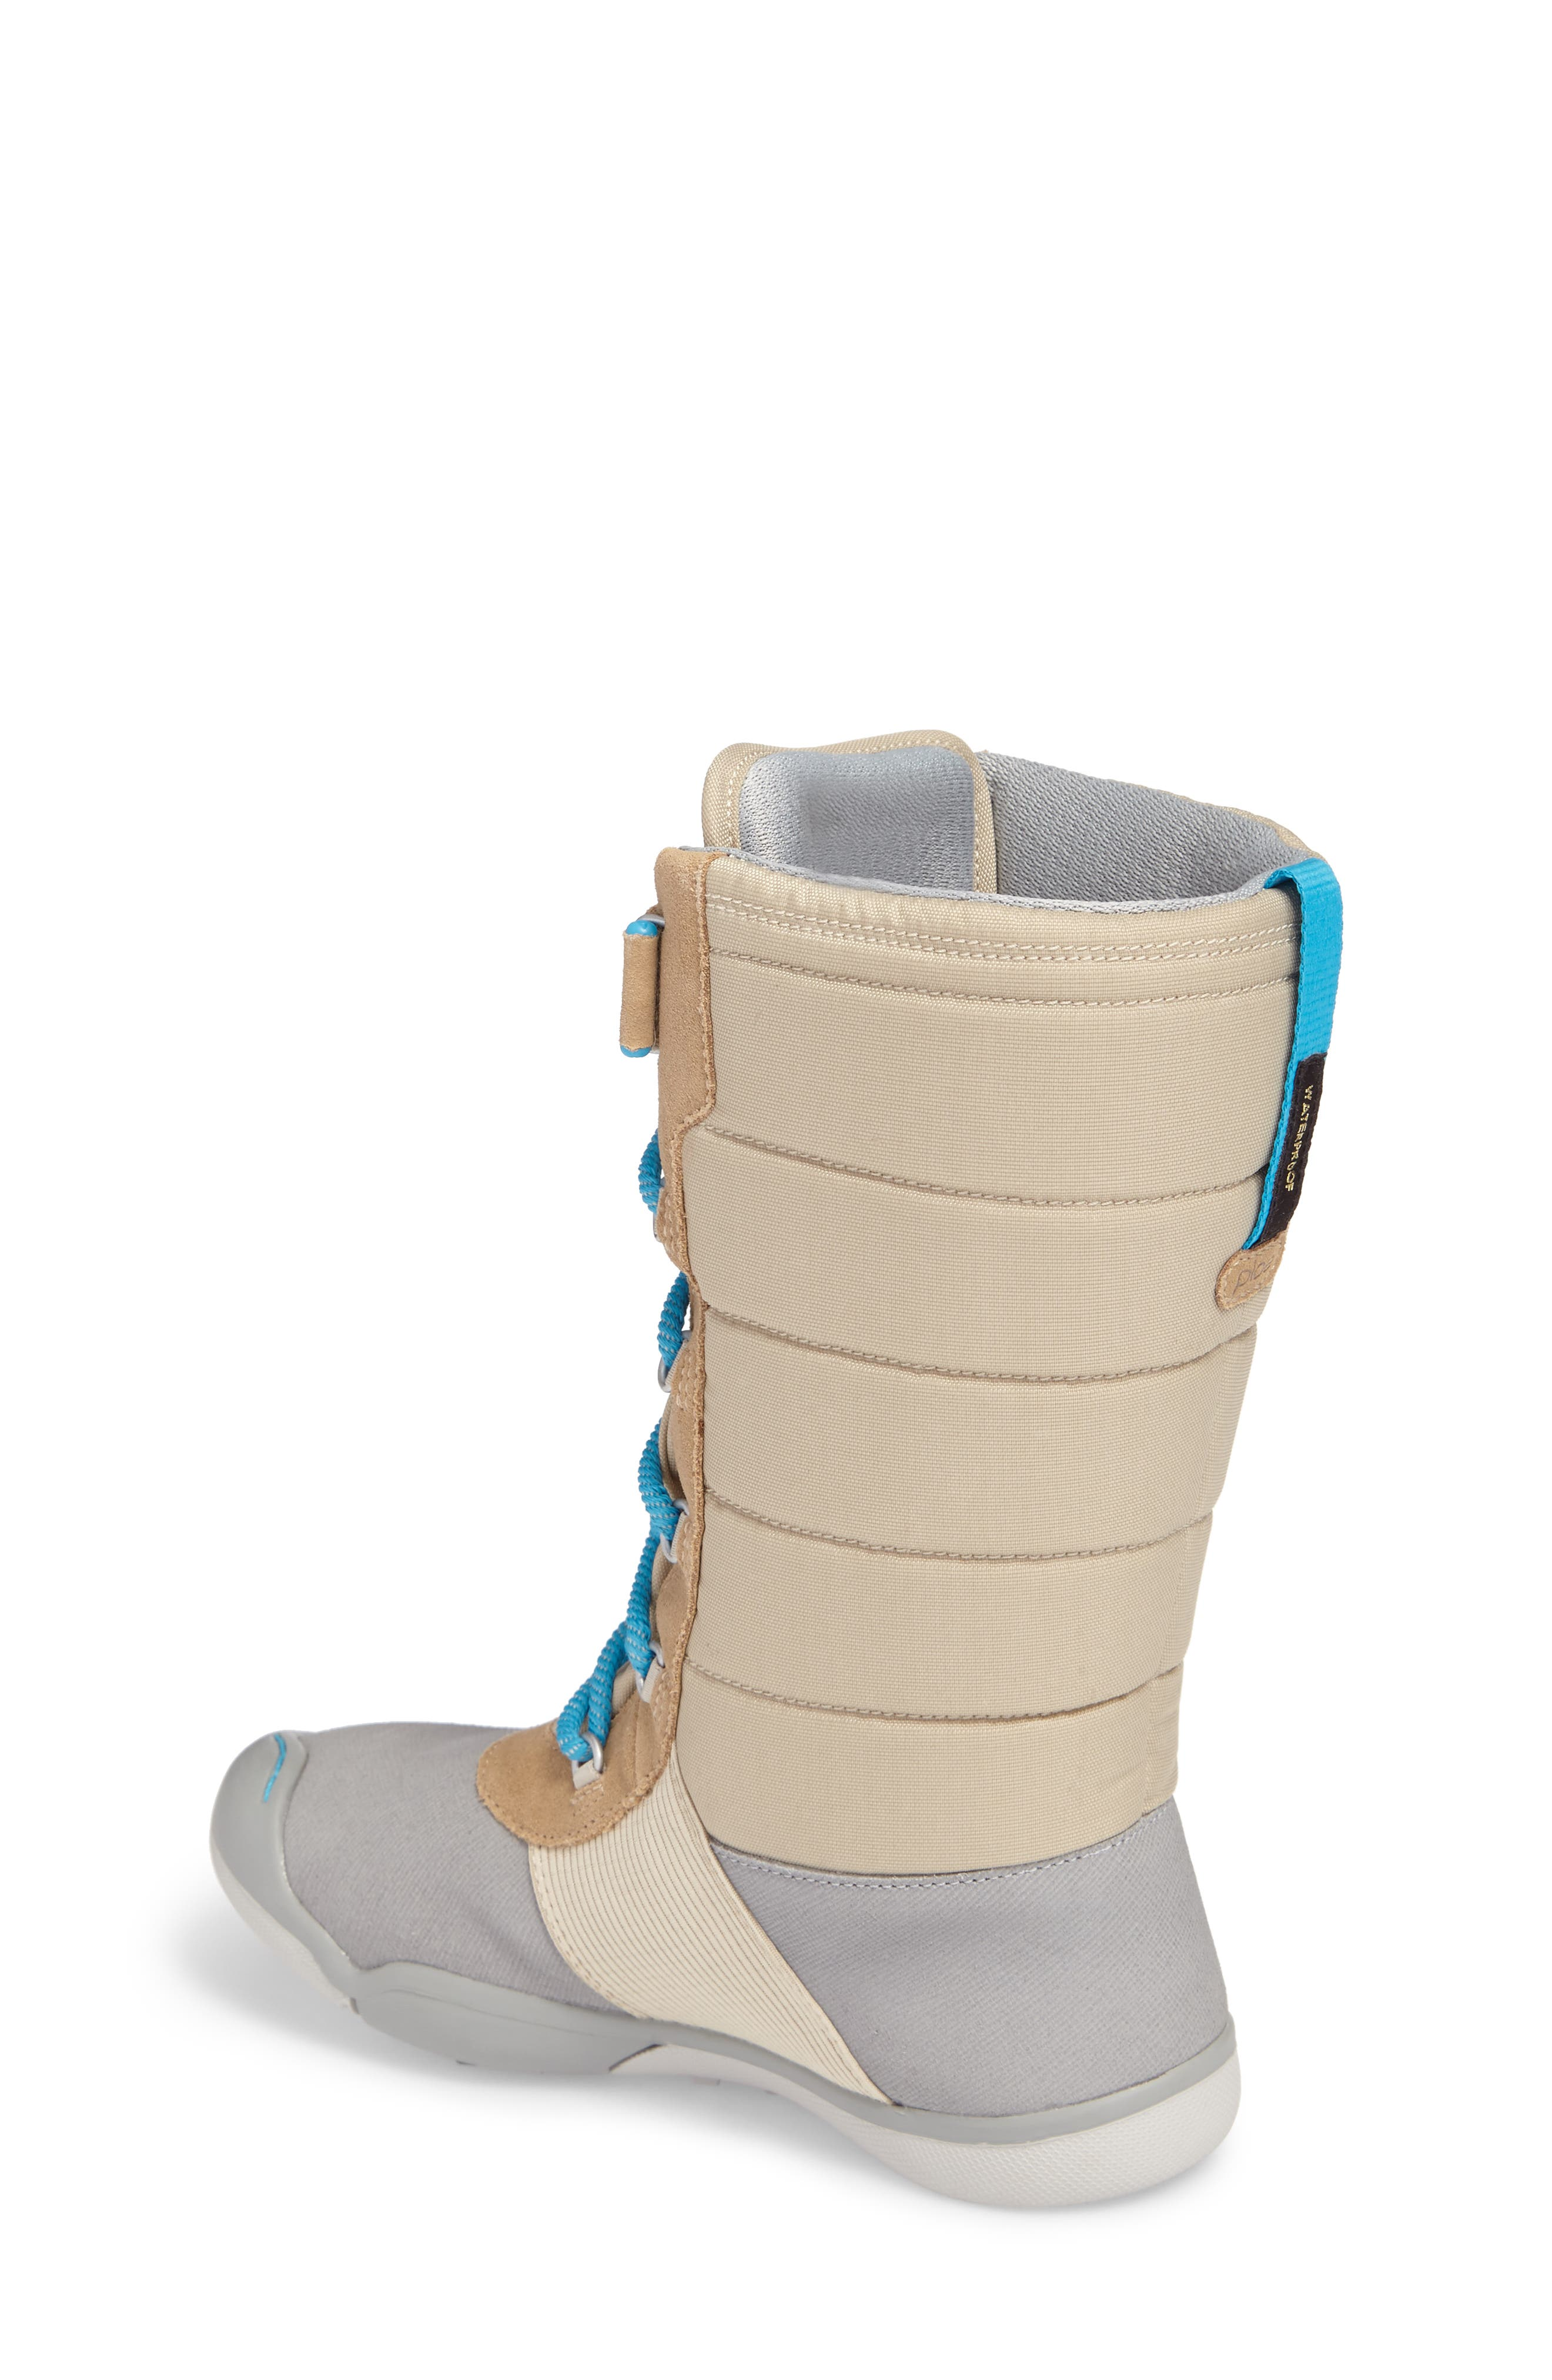 Jack Customizable Waterproof Boot,                             Alternate thumbnail 2, color,                             Light